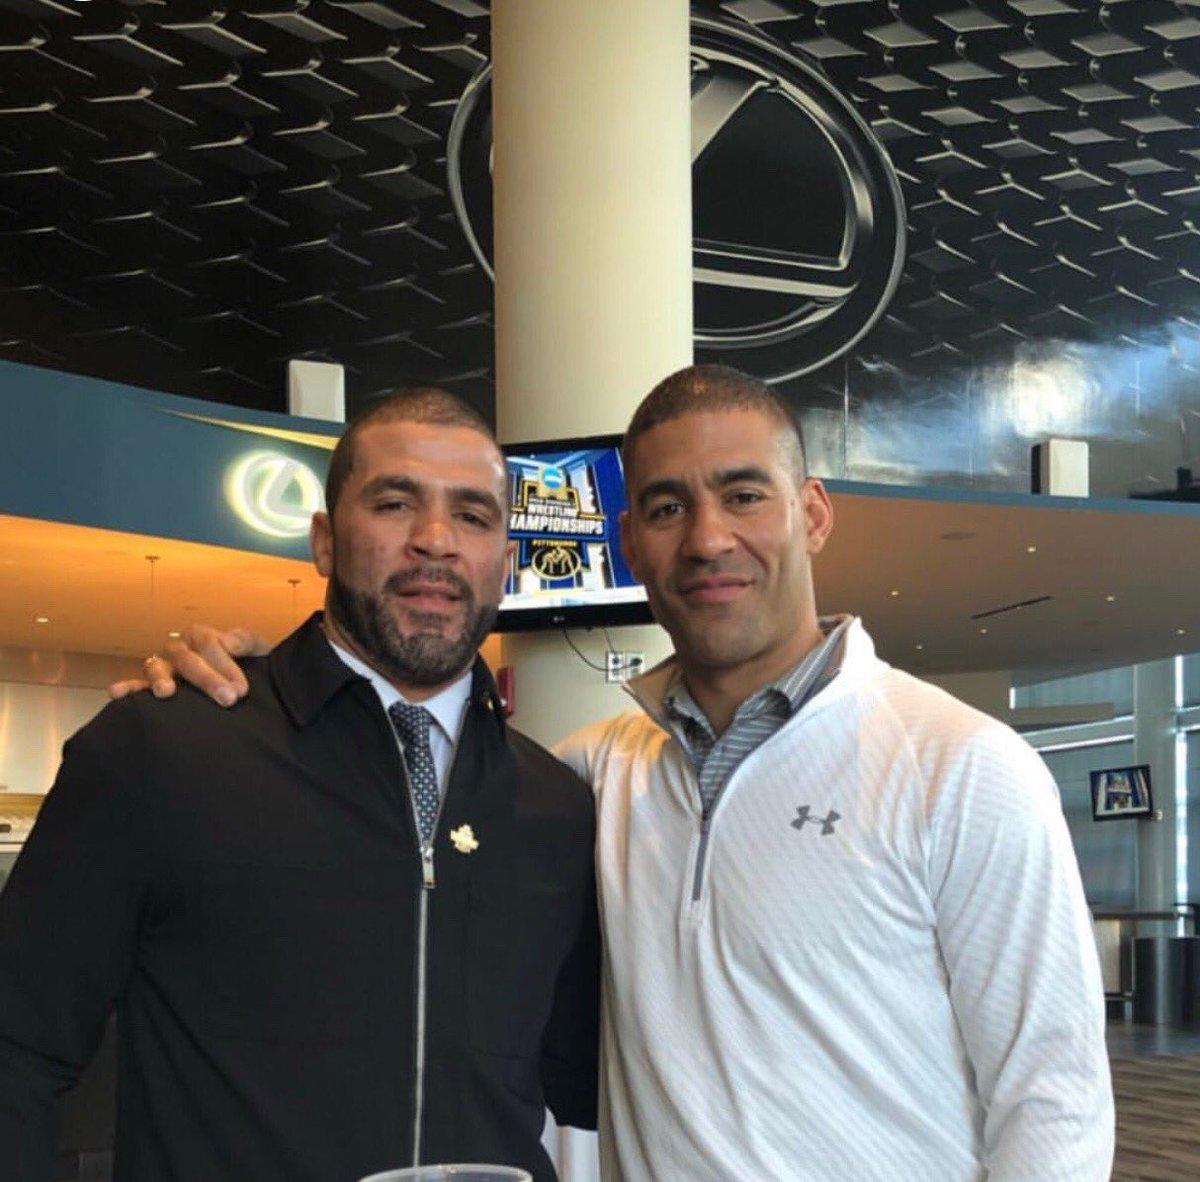 Good to see the champ back in town! @CoachGJones @ncaawrestling @WVUWrestling #jonesbrothers #slickvillepa